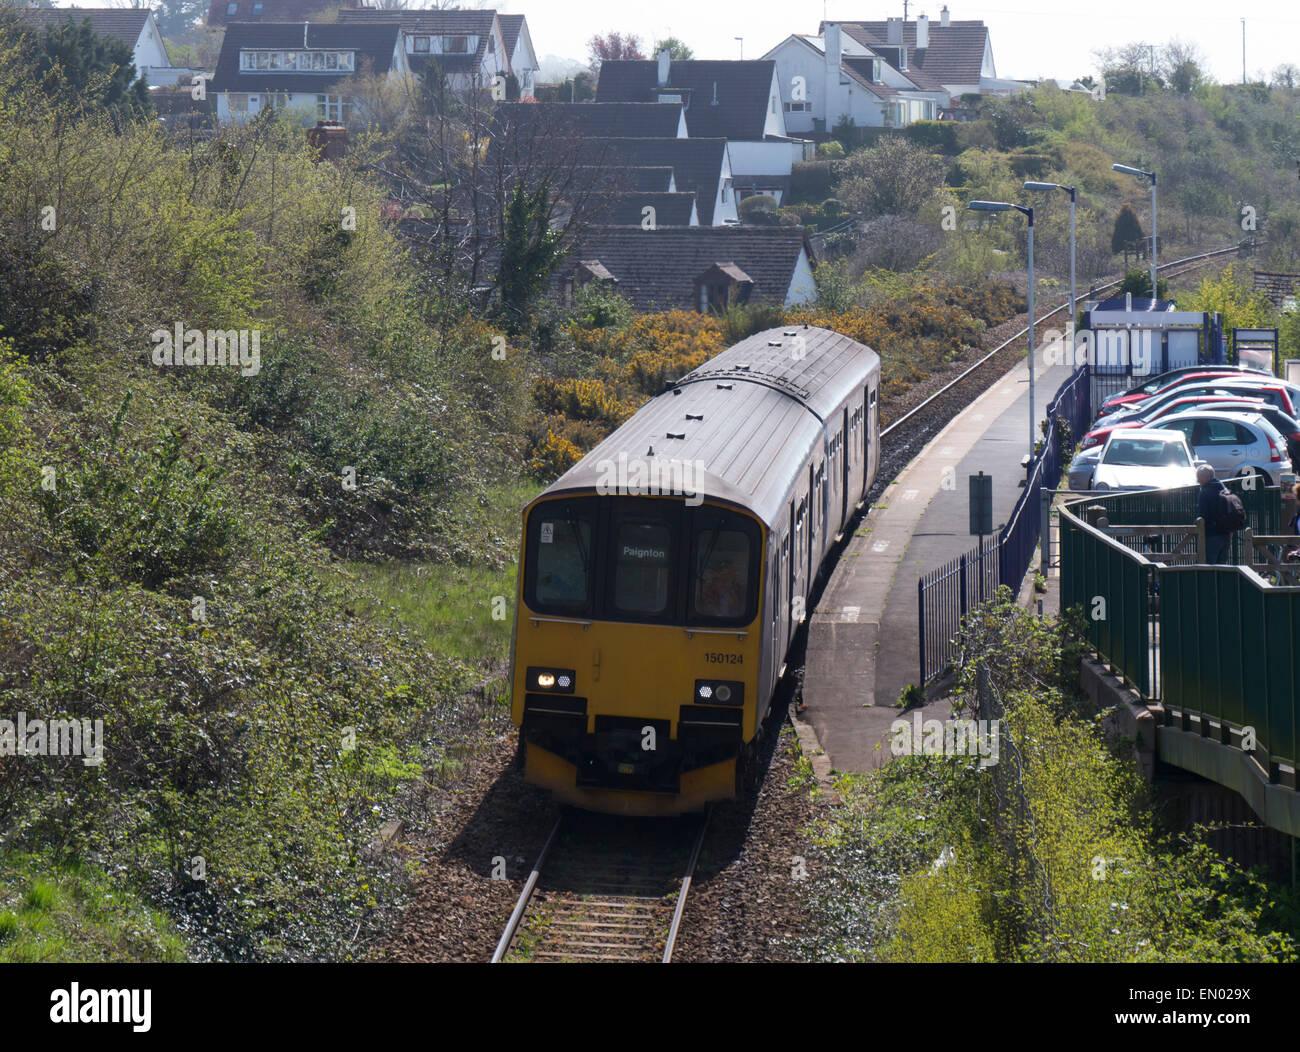 europe, uk, england, devon, Exe estuary train - Stock Image